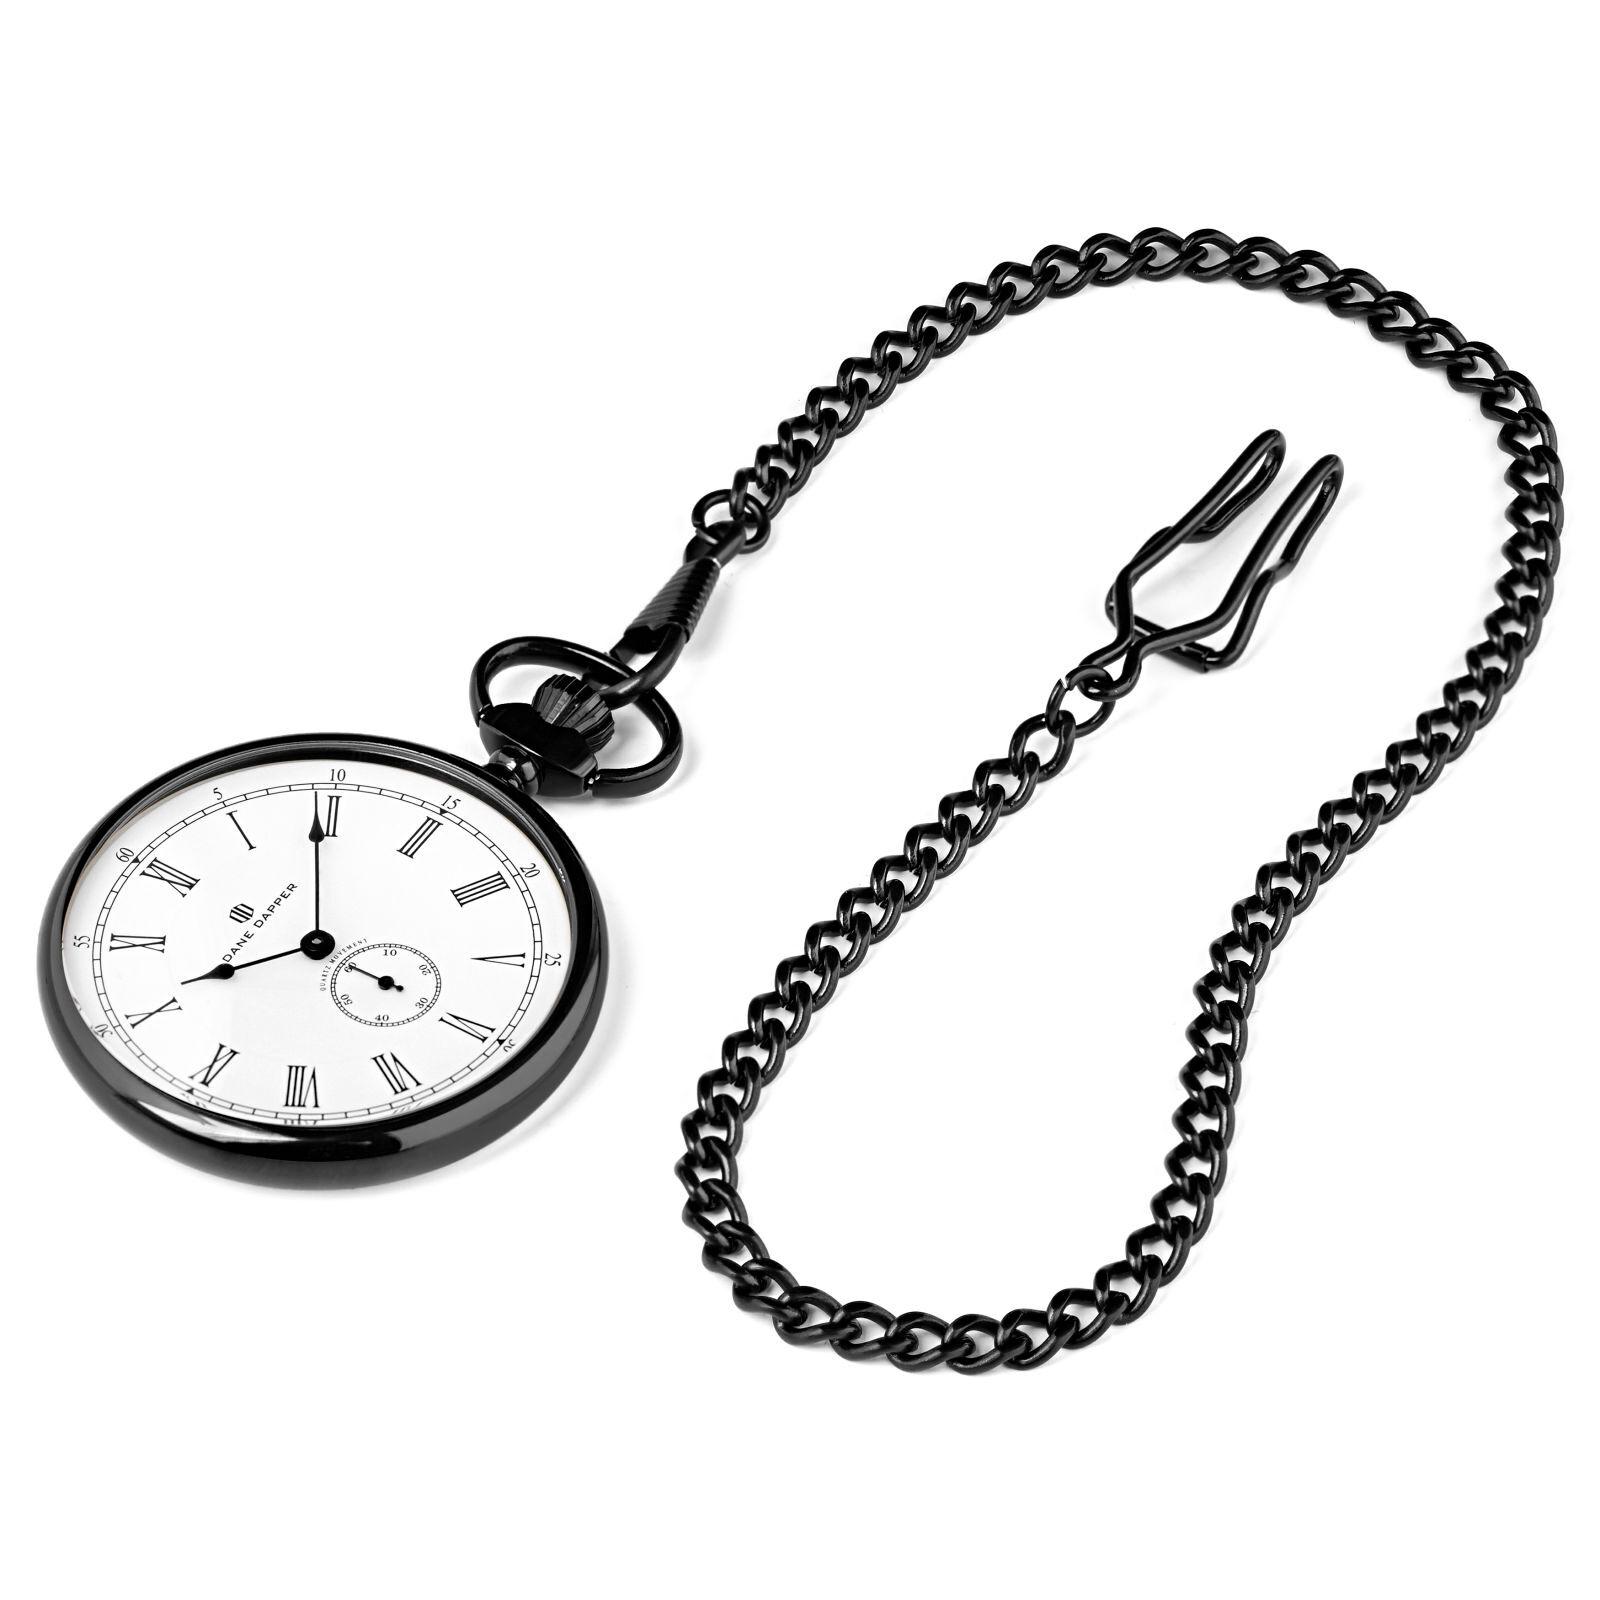 Dane Dapper Musta & valkoinen Time Keeper -taskukello